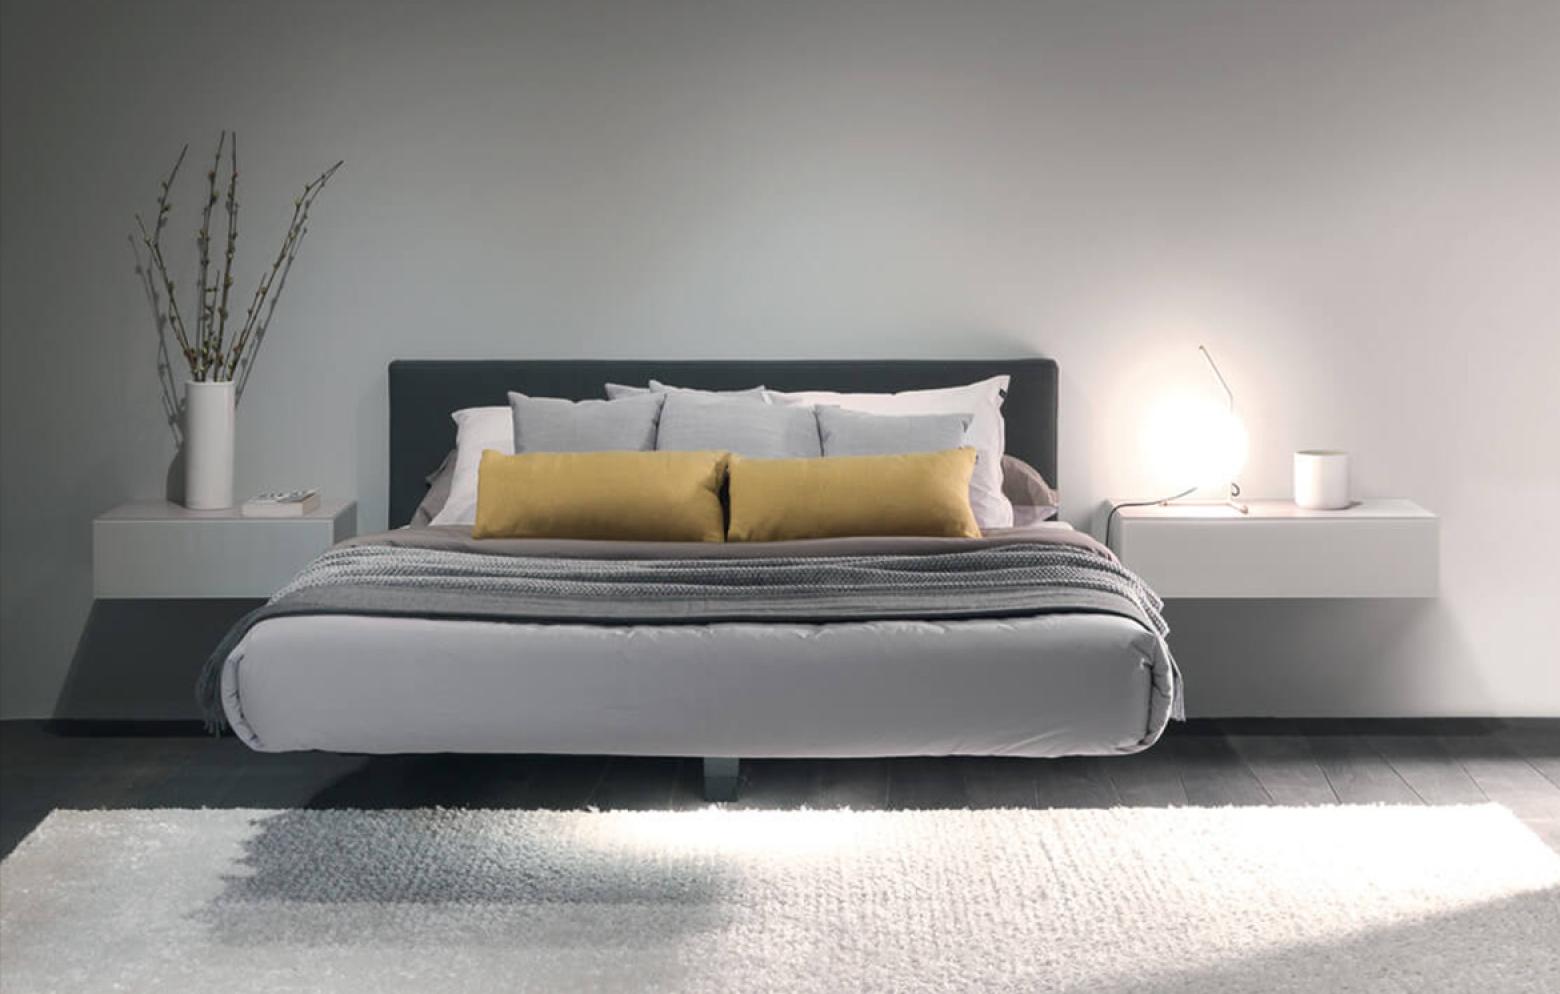 who s perfect betten squaring betten betten schr nke who. Black Bedroom Furniture Sets. Home Design Ideas